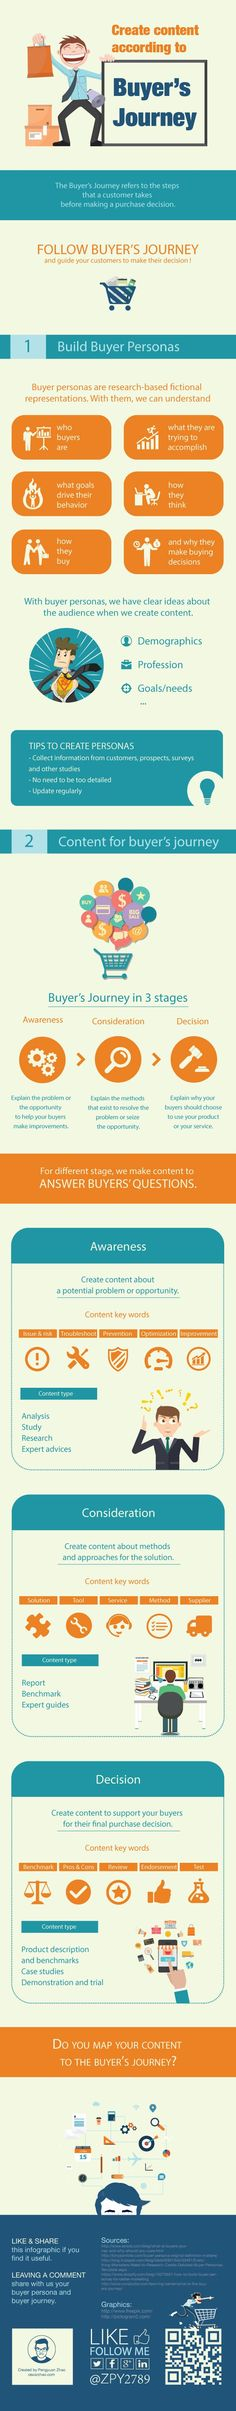 create-content-according-to-buyer's-journey